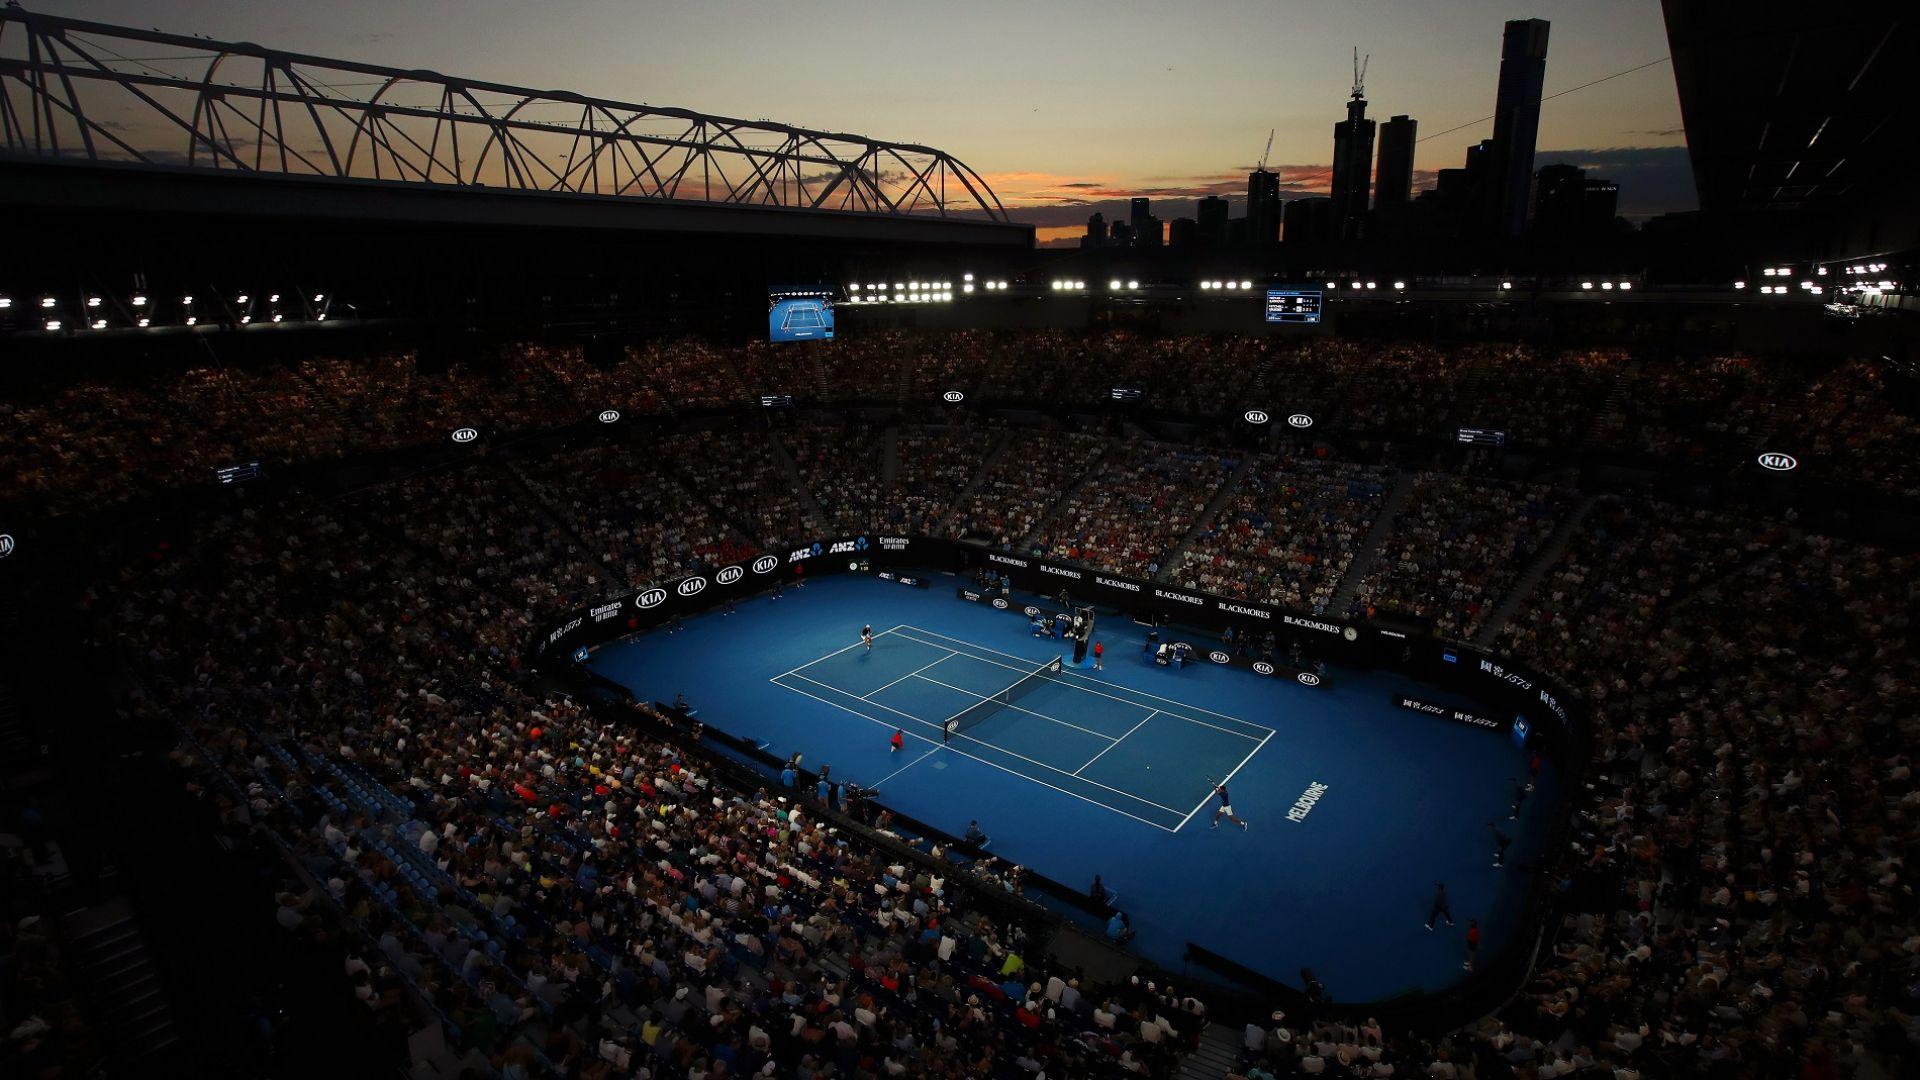 Australian open увеличи наградния фонд, докосва 50 млн. долара